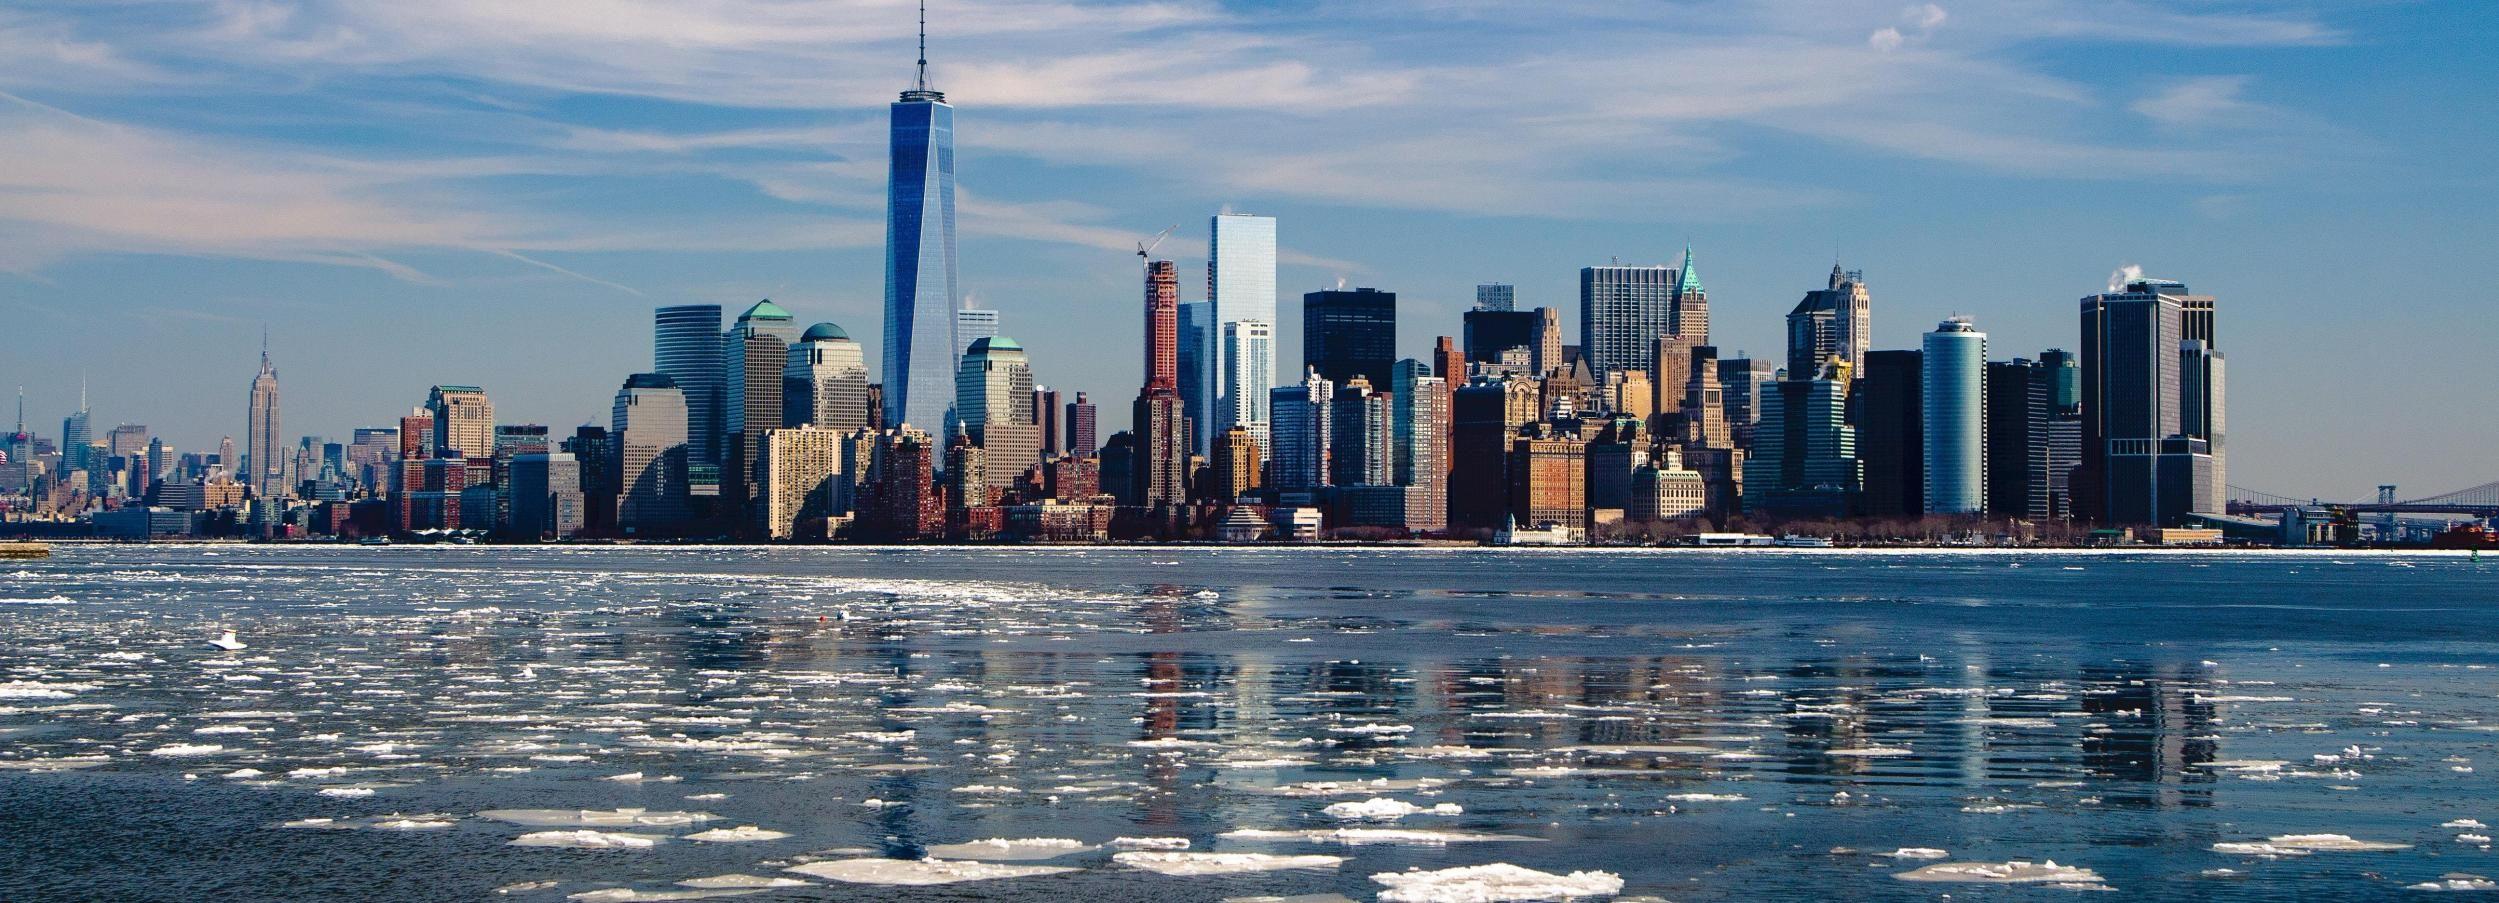 New York City: Morning Skyline Tour